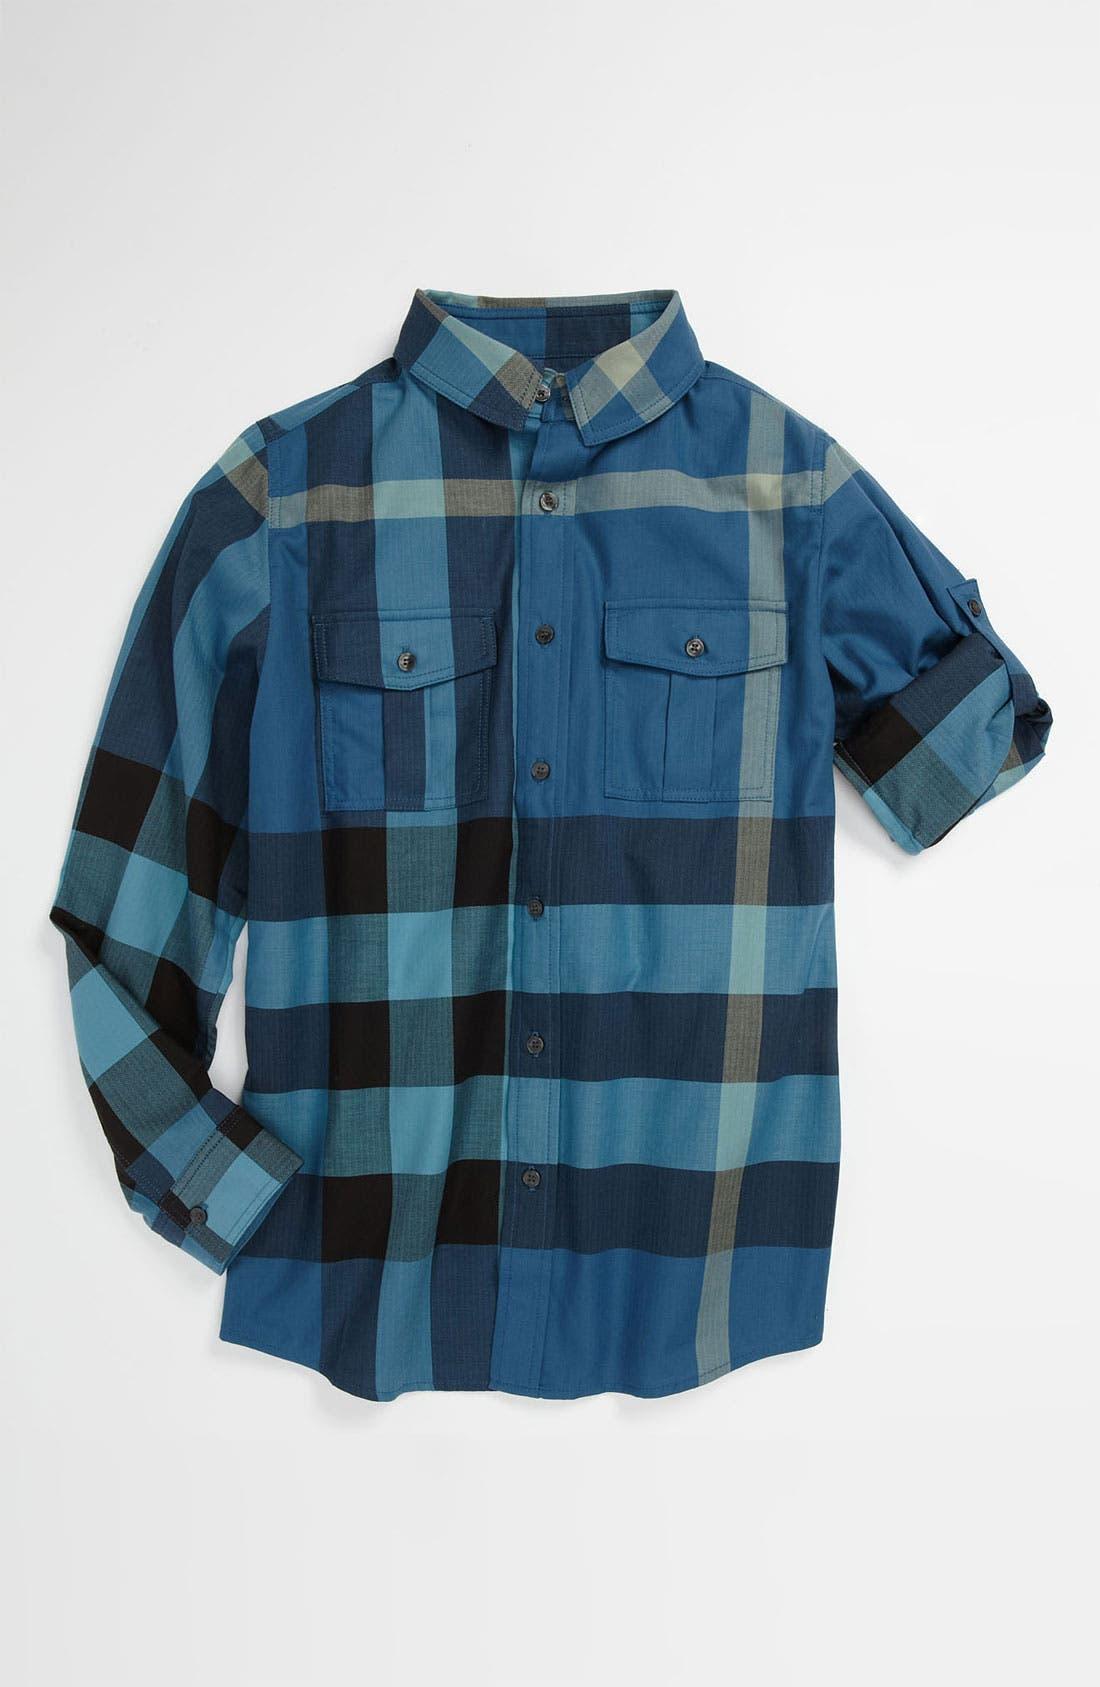 Main Image - Burberry 'Slough' Woven Shirt (Big Boys)